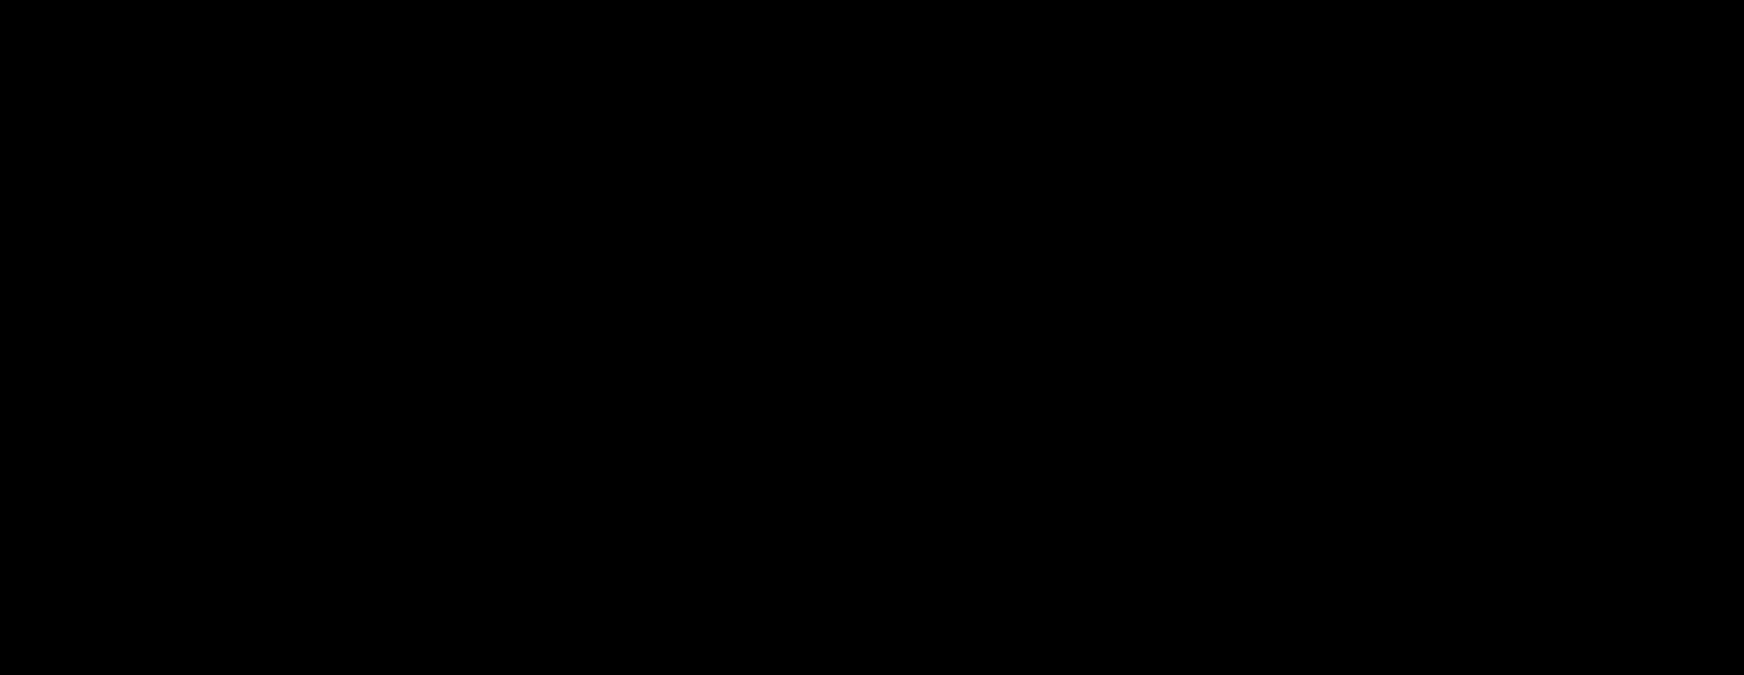 Methotrexate-d<sub>3</sub> Dimethyl Ester